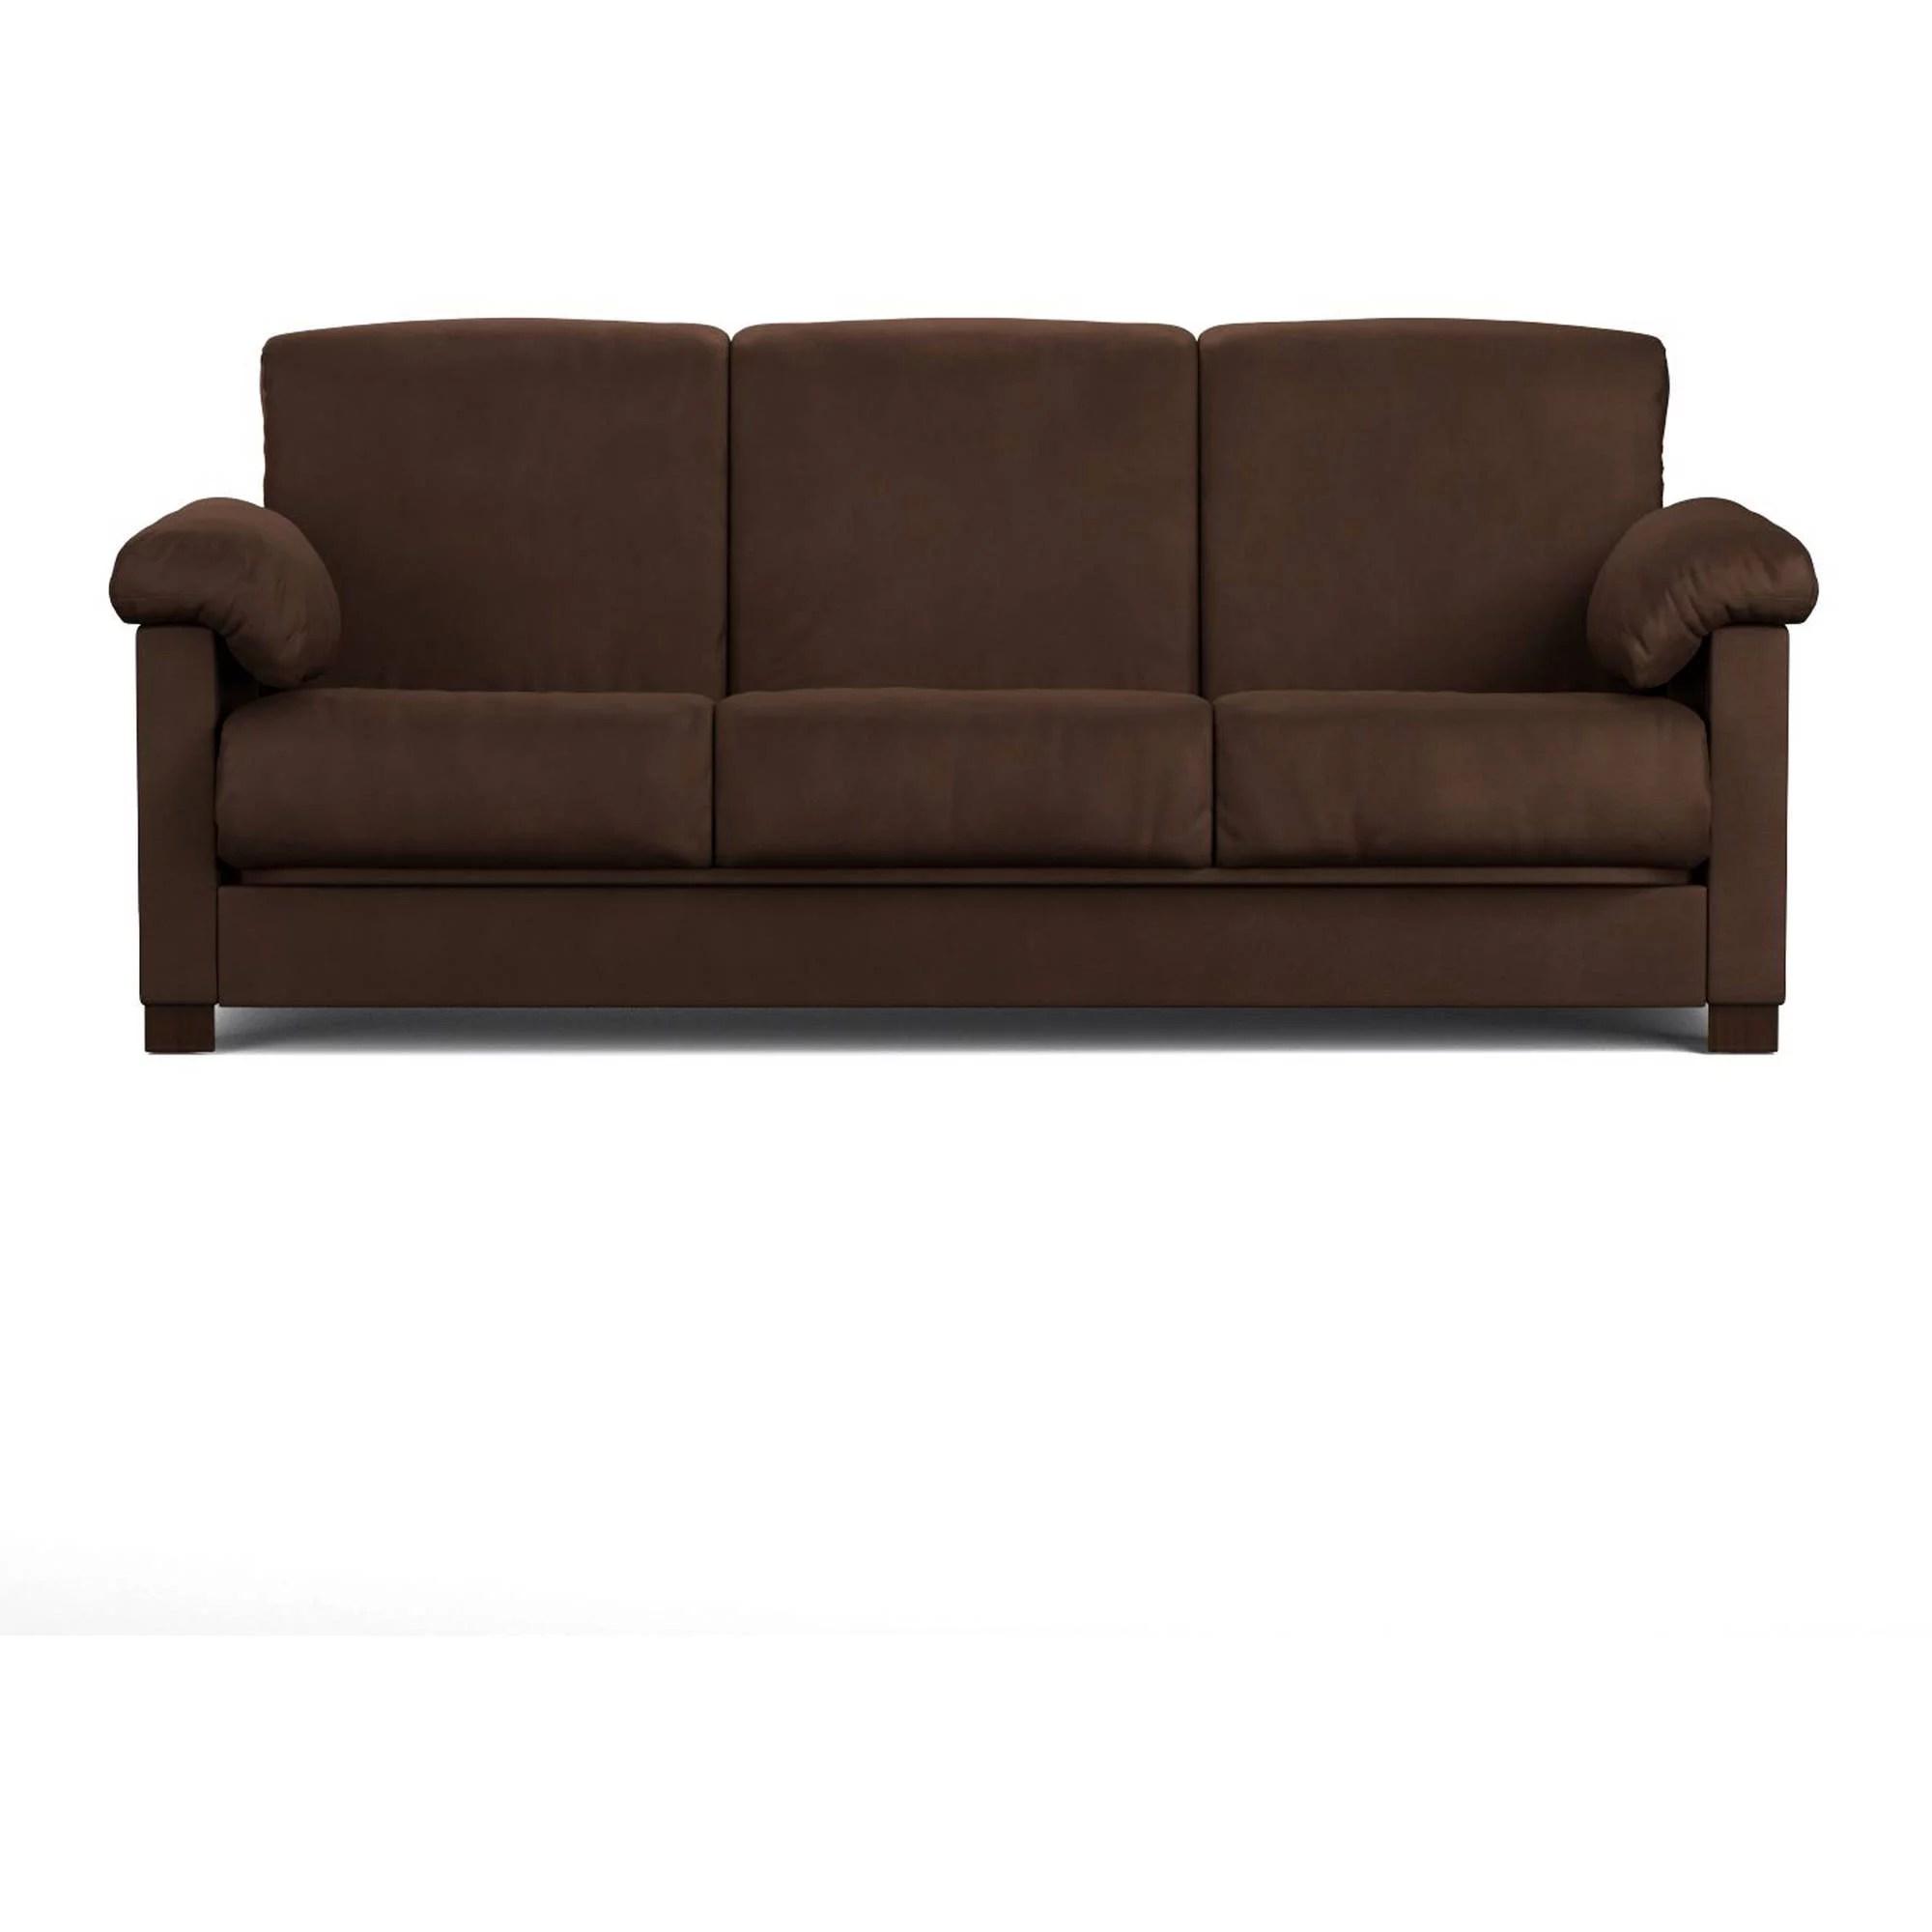 Montero Microfiber Convert A Couch Sofa Bed Review wwwelderbranchcom